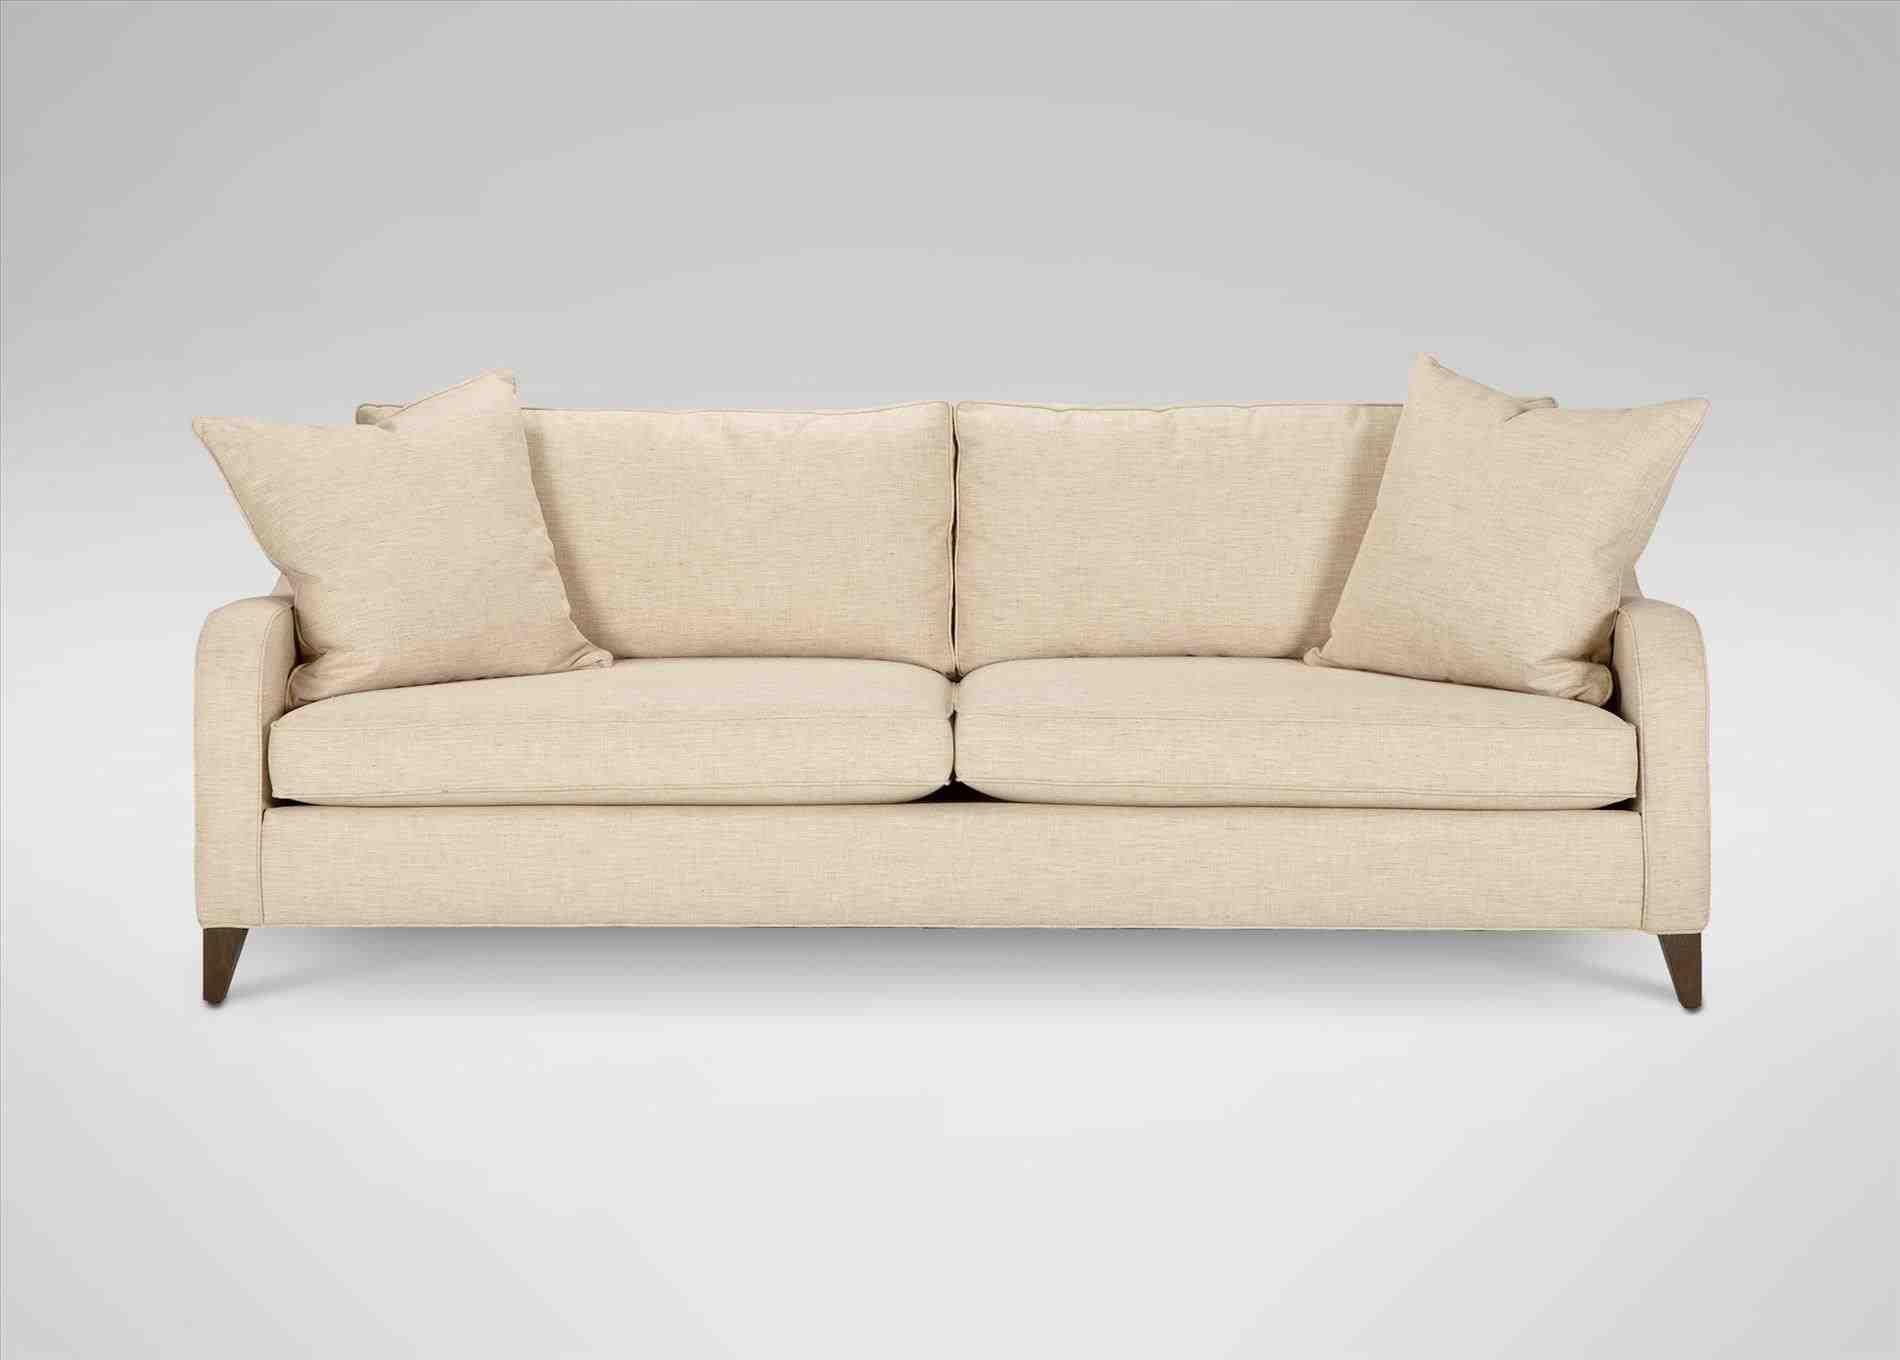 Ethan Allen Chair And A Half  Ethan Allen Sofa Bed | Ethan Allen Couch | Ethan  Allen Slipcover Sofa. Randall Leather Recliner U2013 Ethan Allen ...